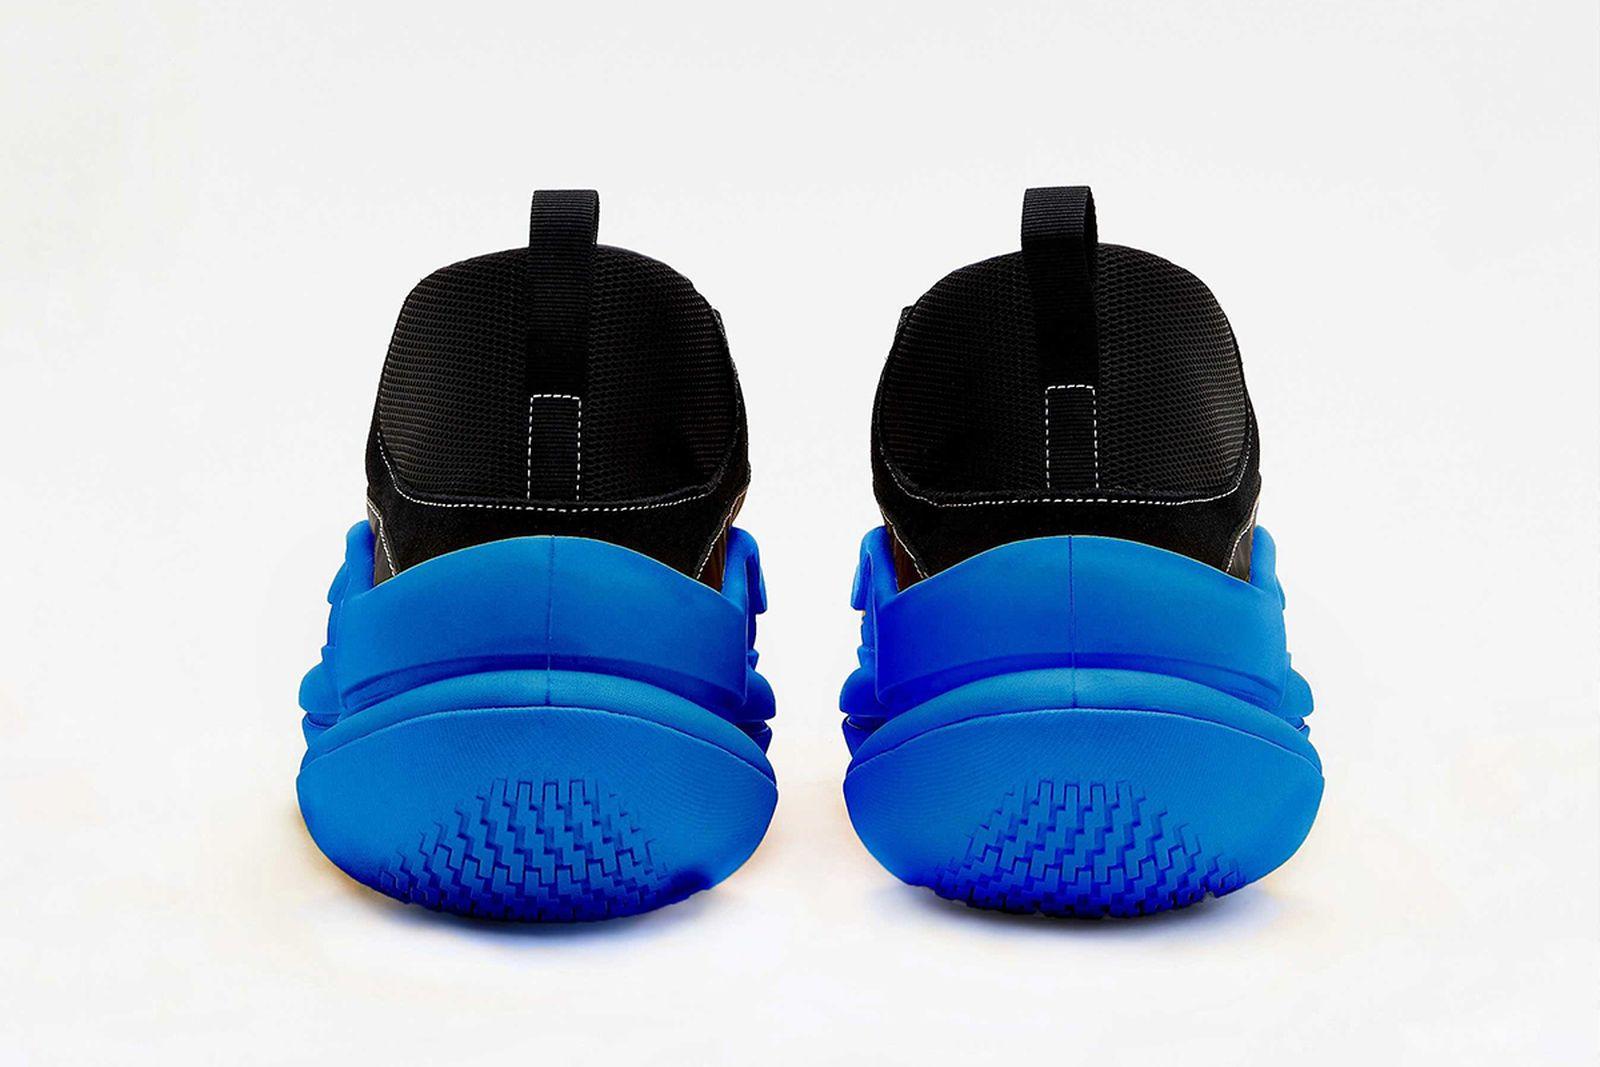 pyer-moss-sculpt-blue-release-date-price-02